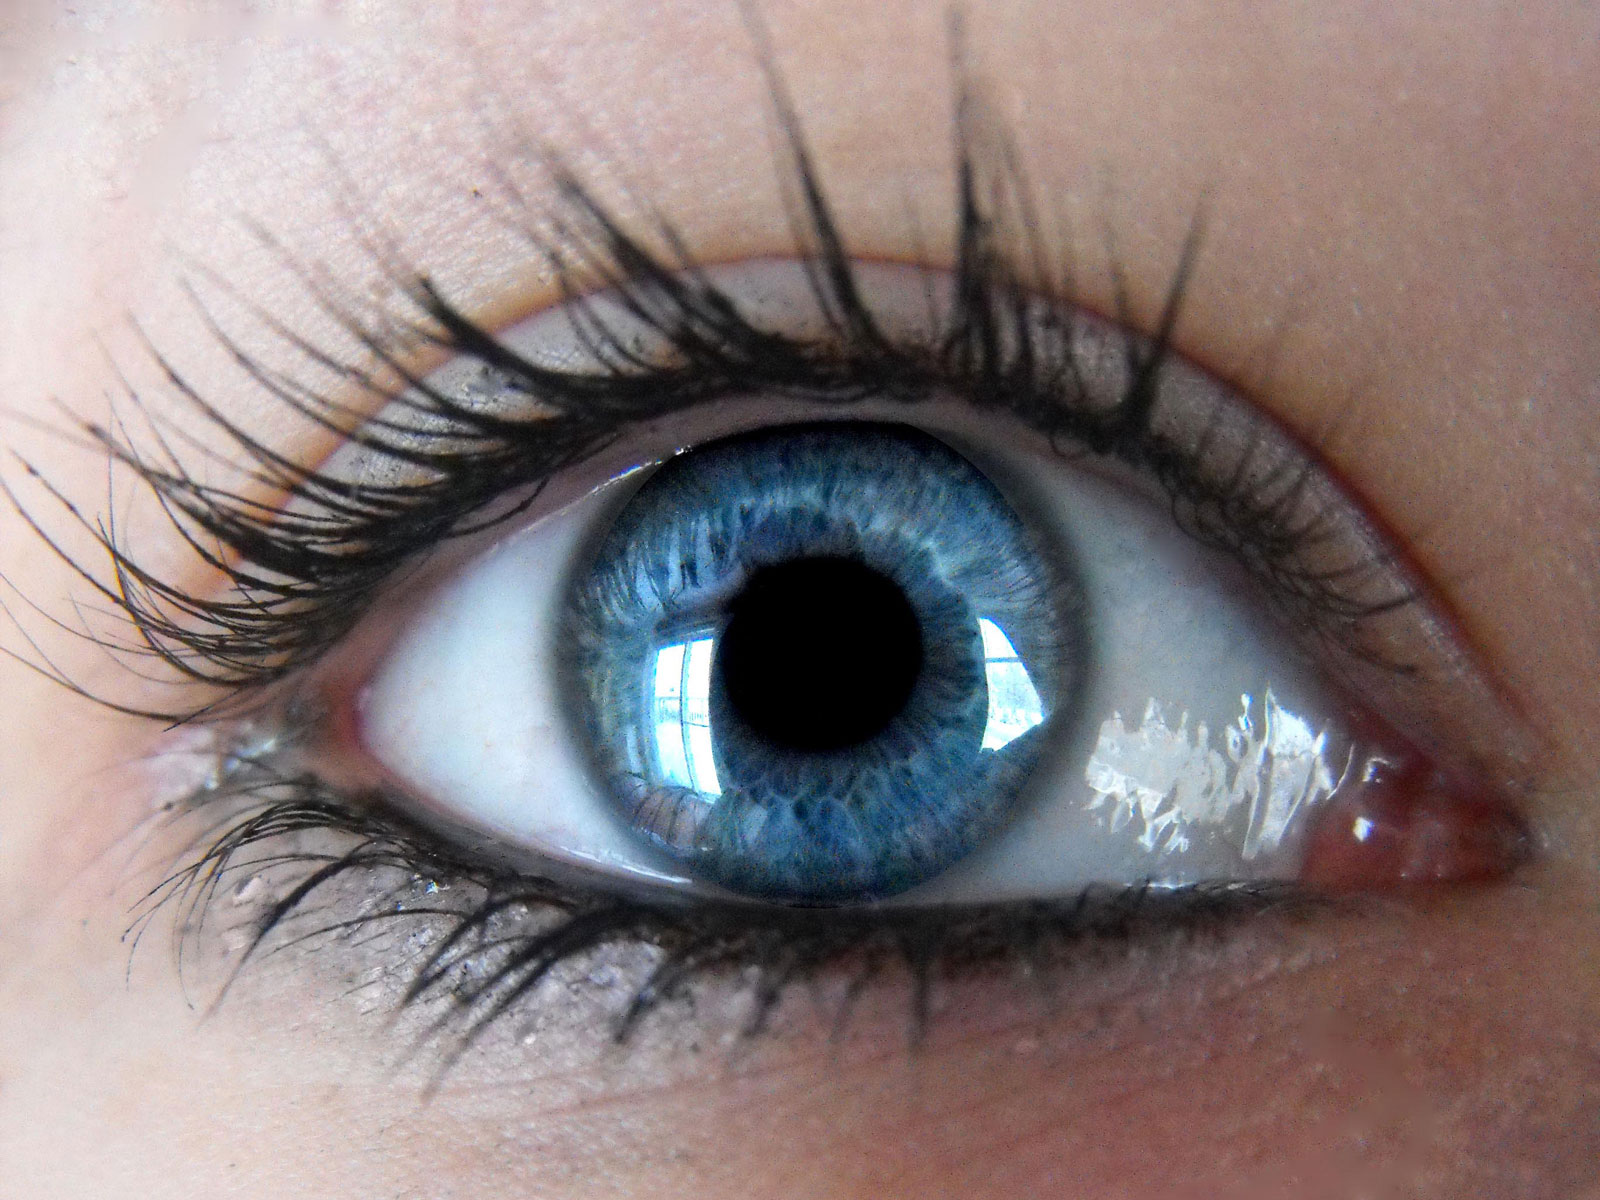 بالصور صور عيون حلوه , اجمل الصور للعيون 562 5